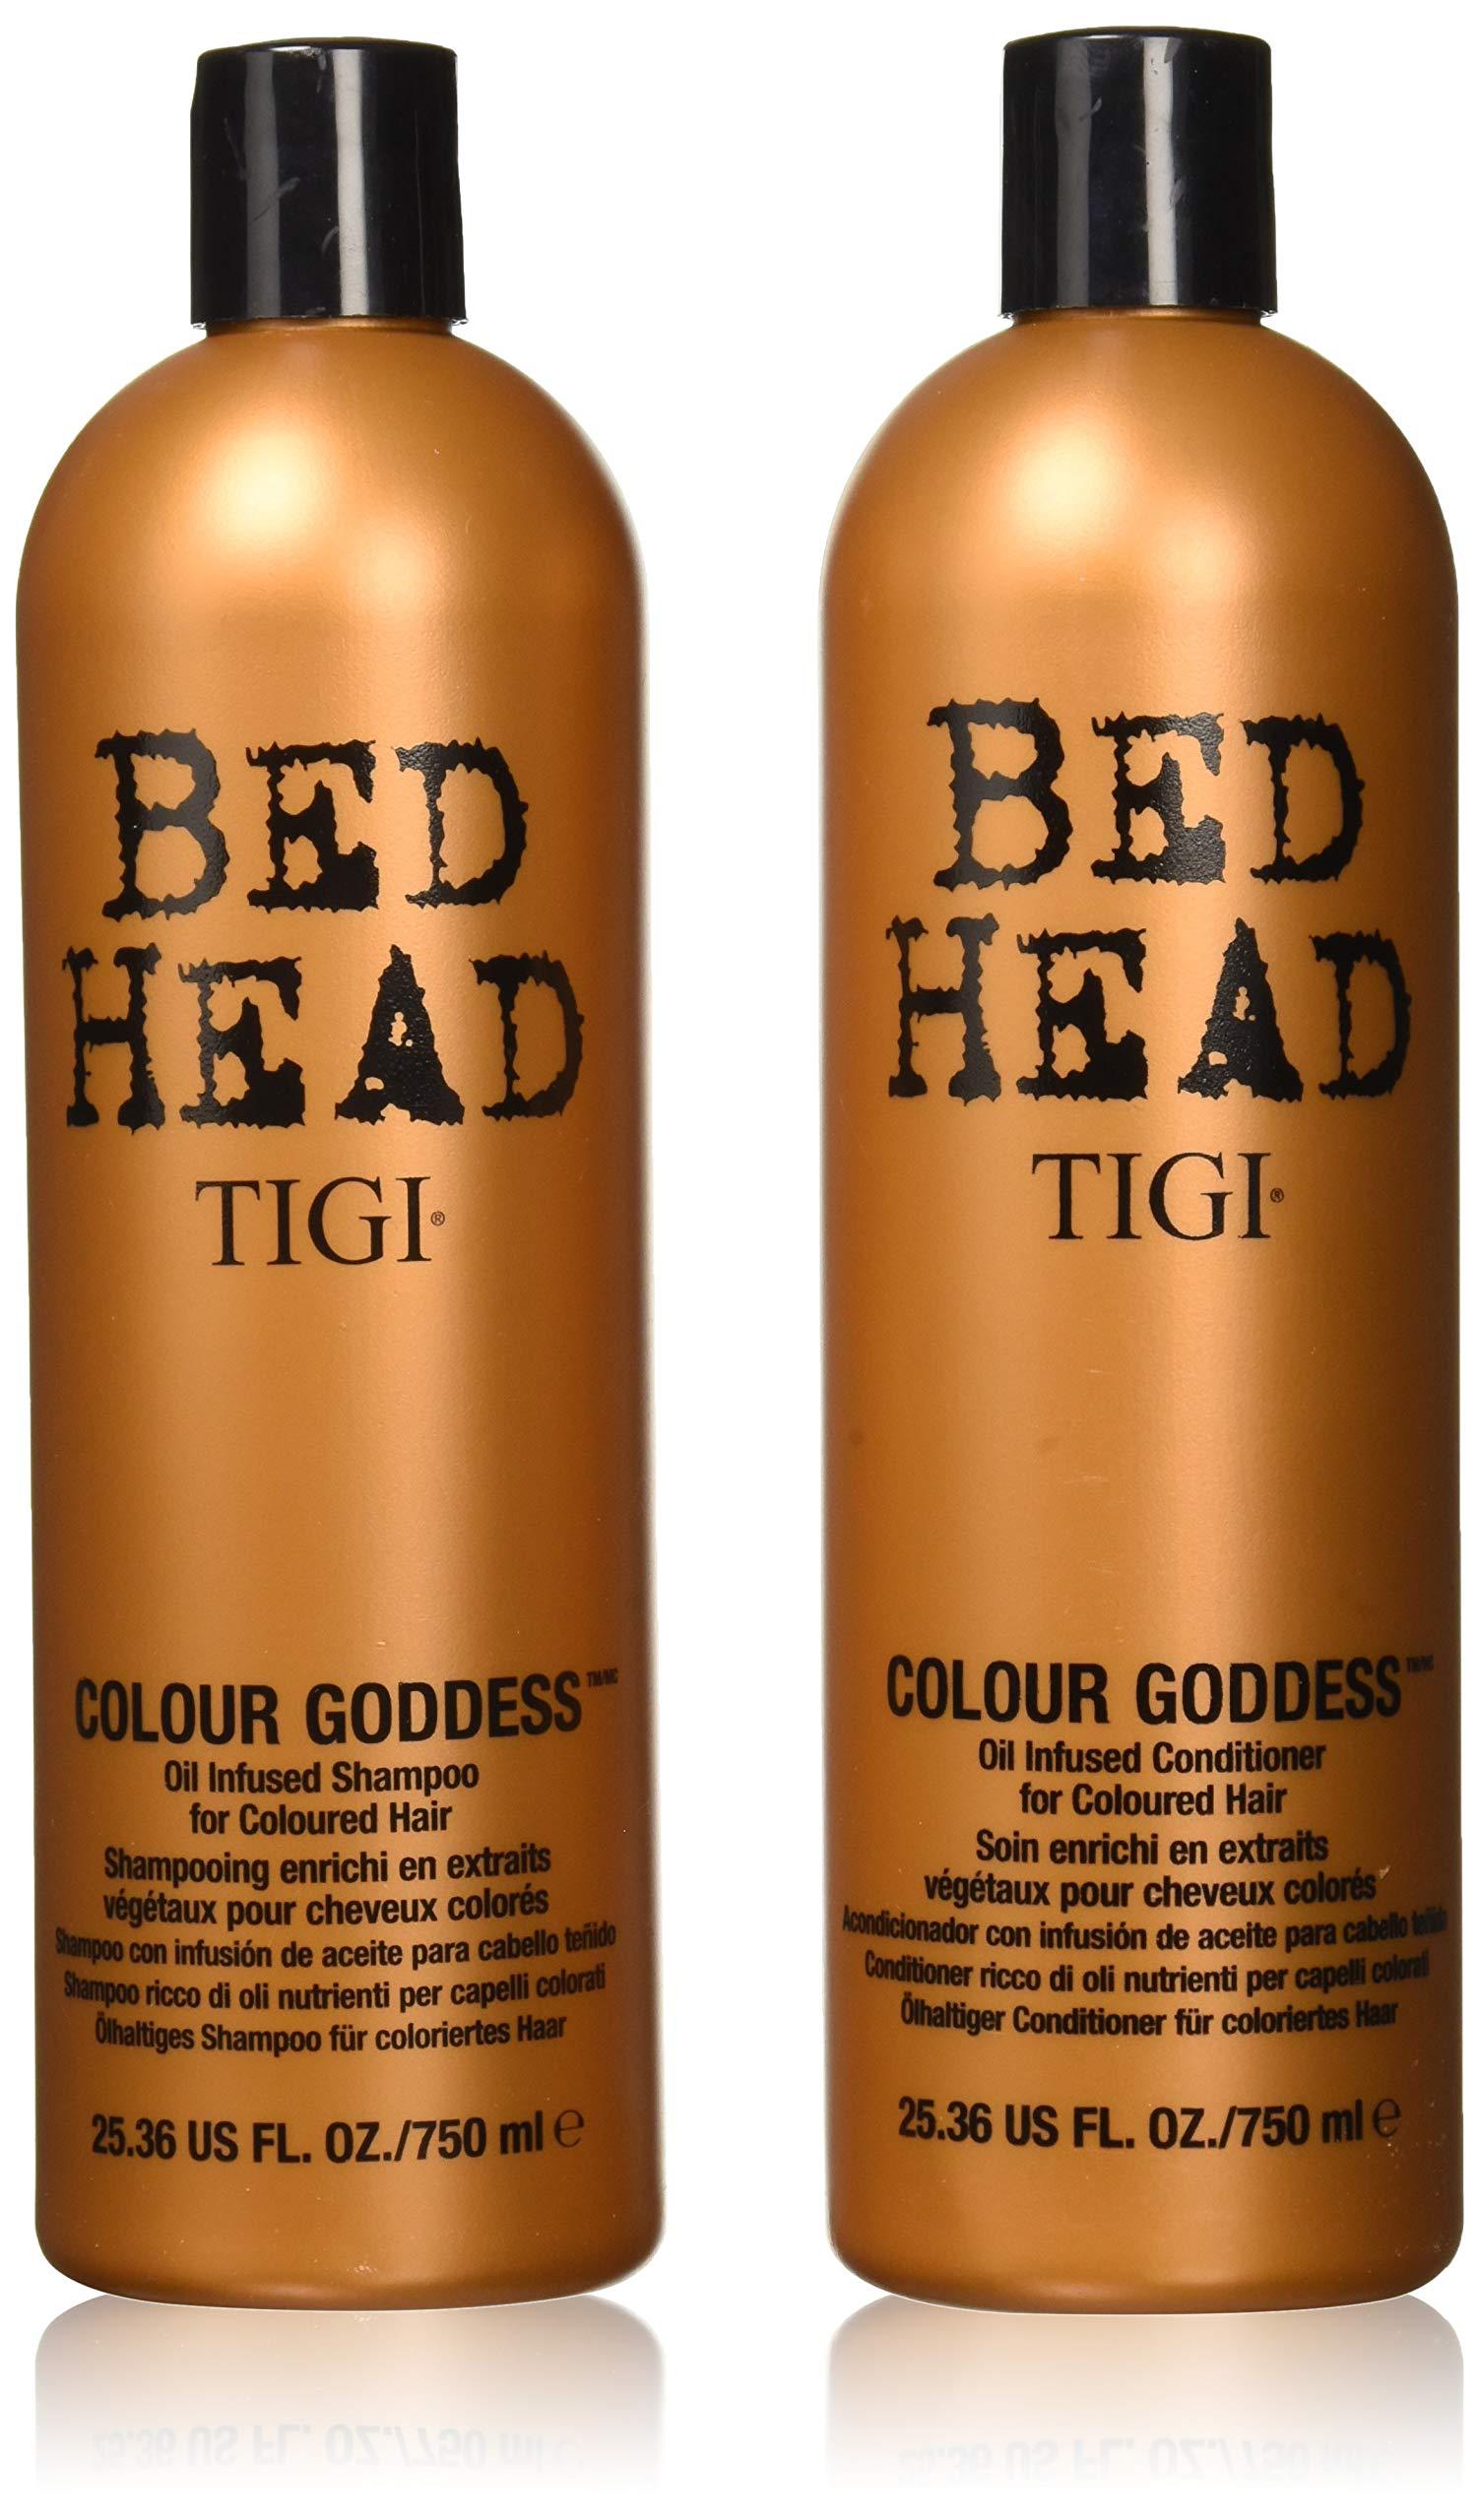 Tigi Bed Head Colour Goddess 25.36oz Duo by TIGI Cosmetics